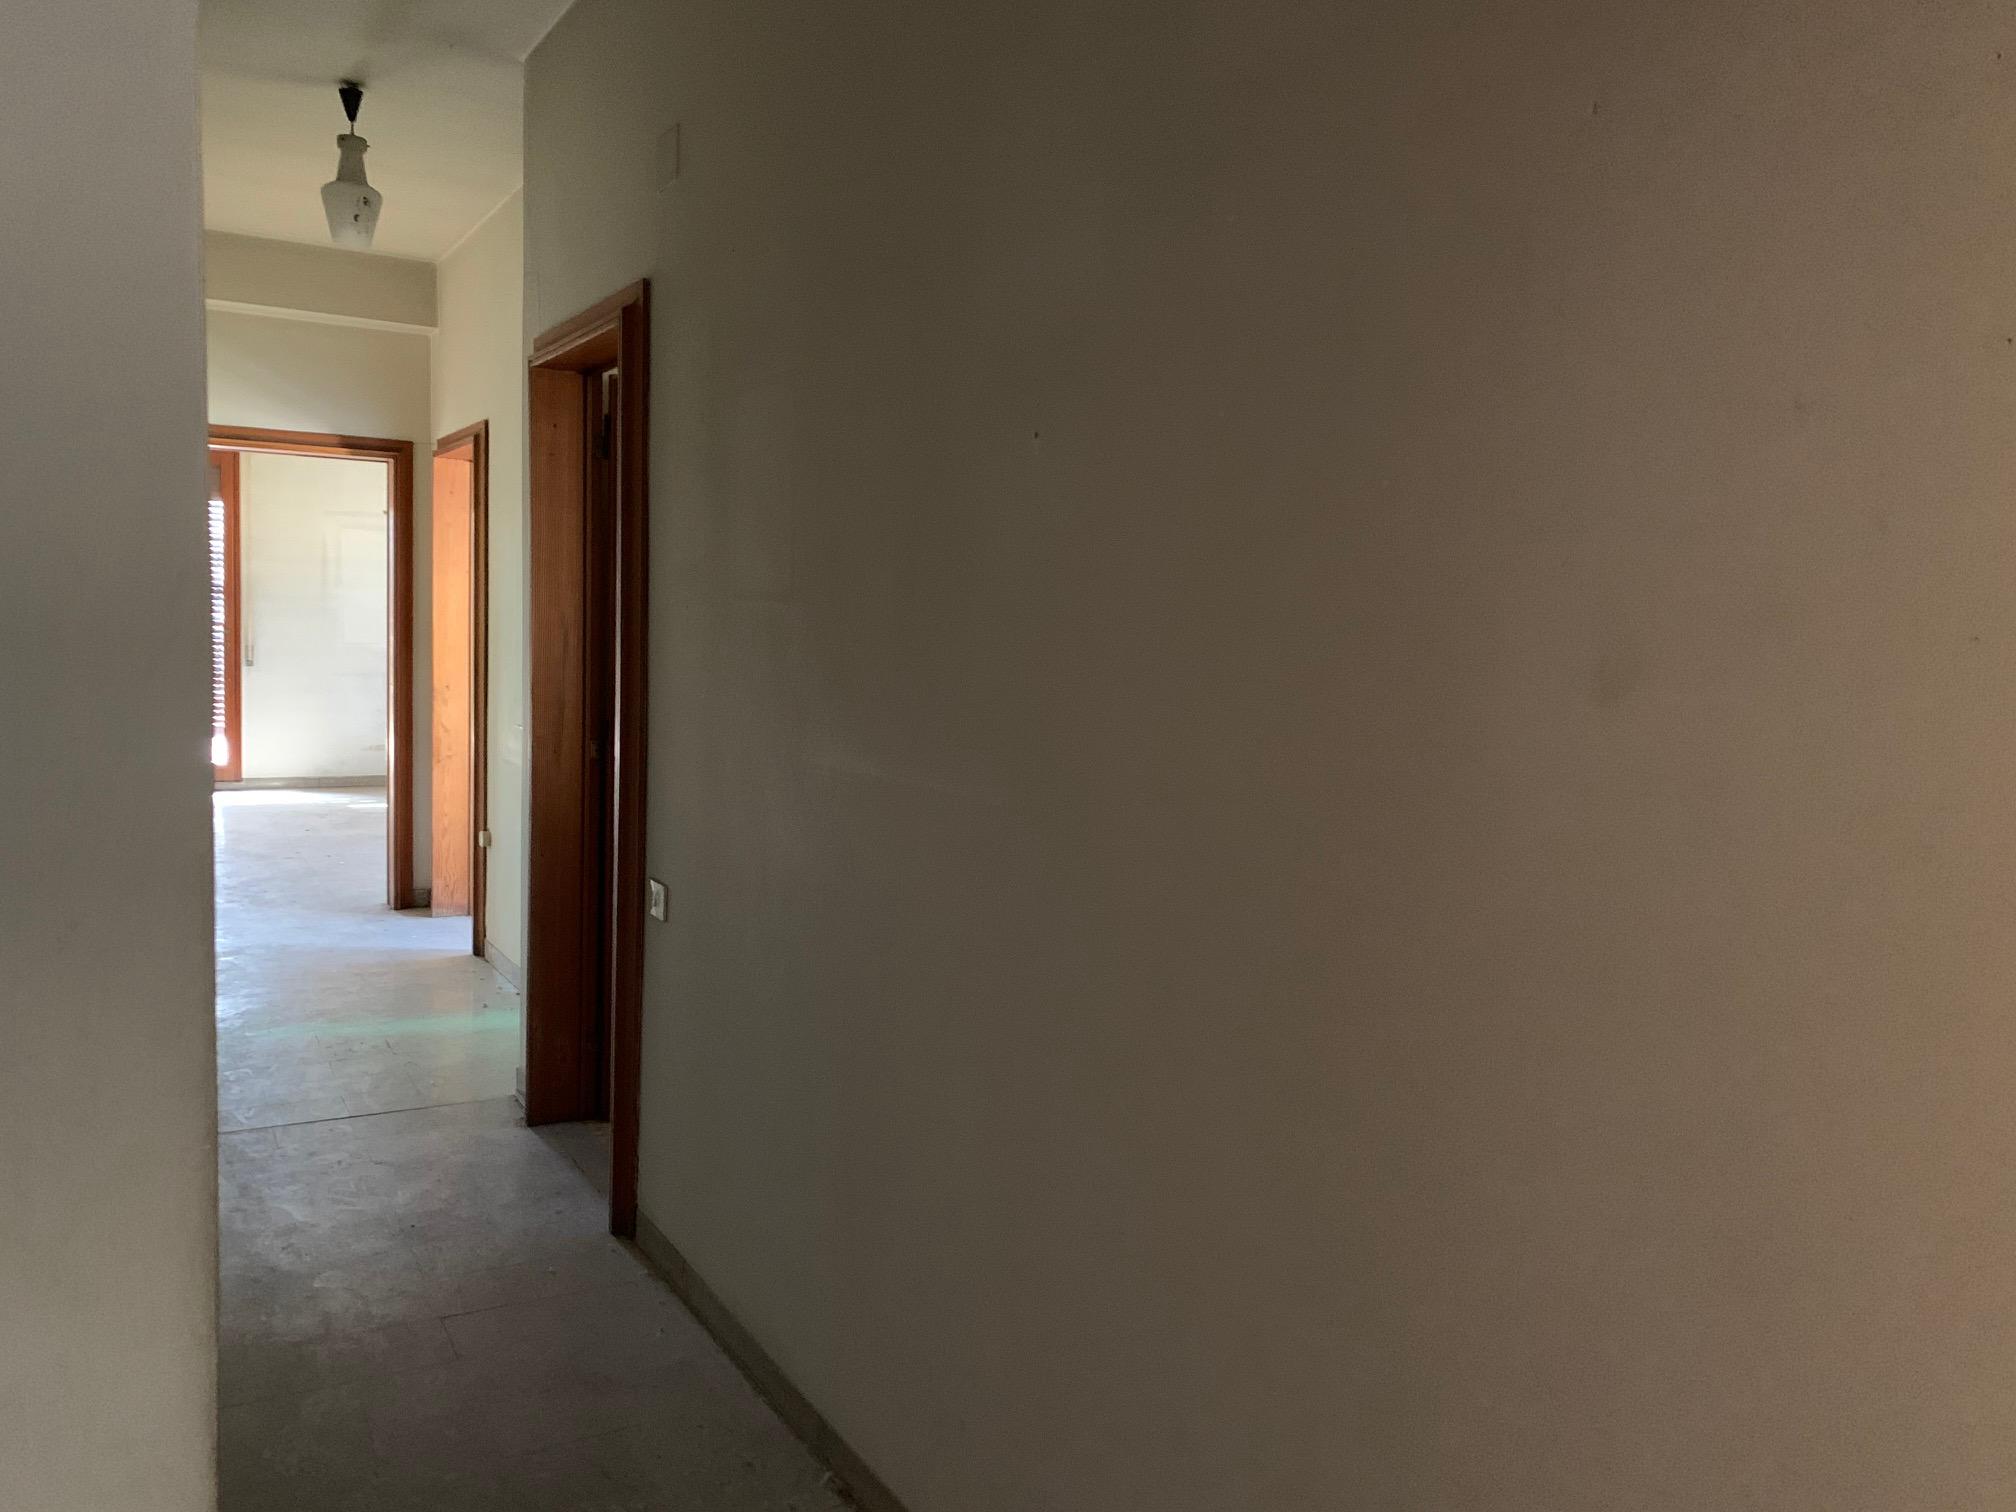 PORTA LUCCHESE,PISTOIA,51100,2 Bedrooms Bedrooms,1 BagnoBathrooms,Appartamento,PORTA LUCCHESE,1441